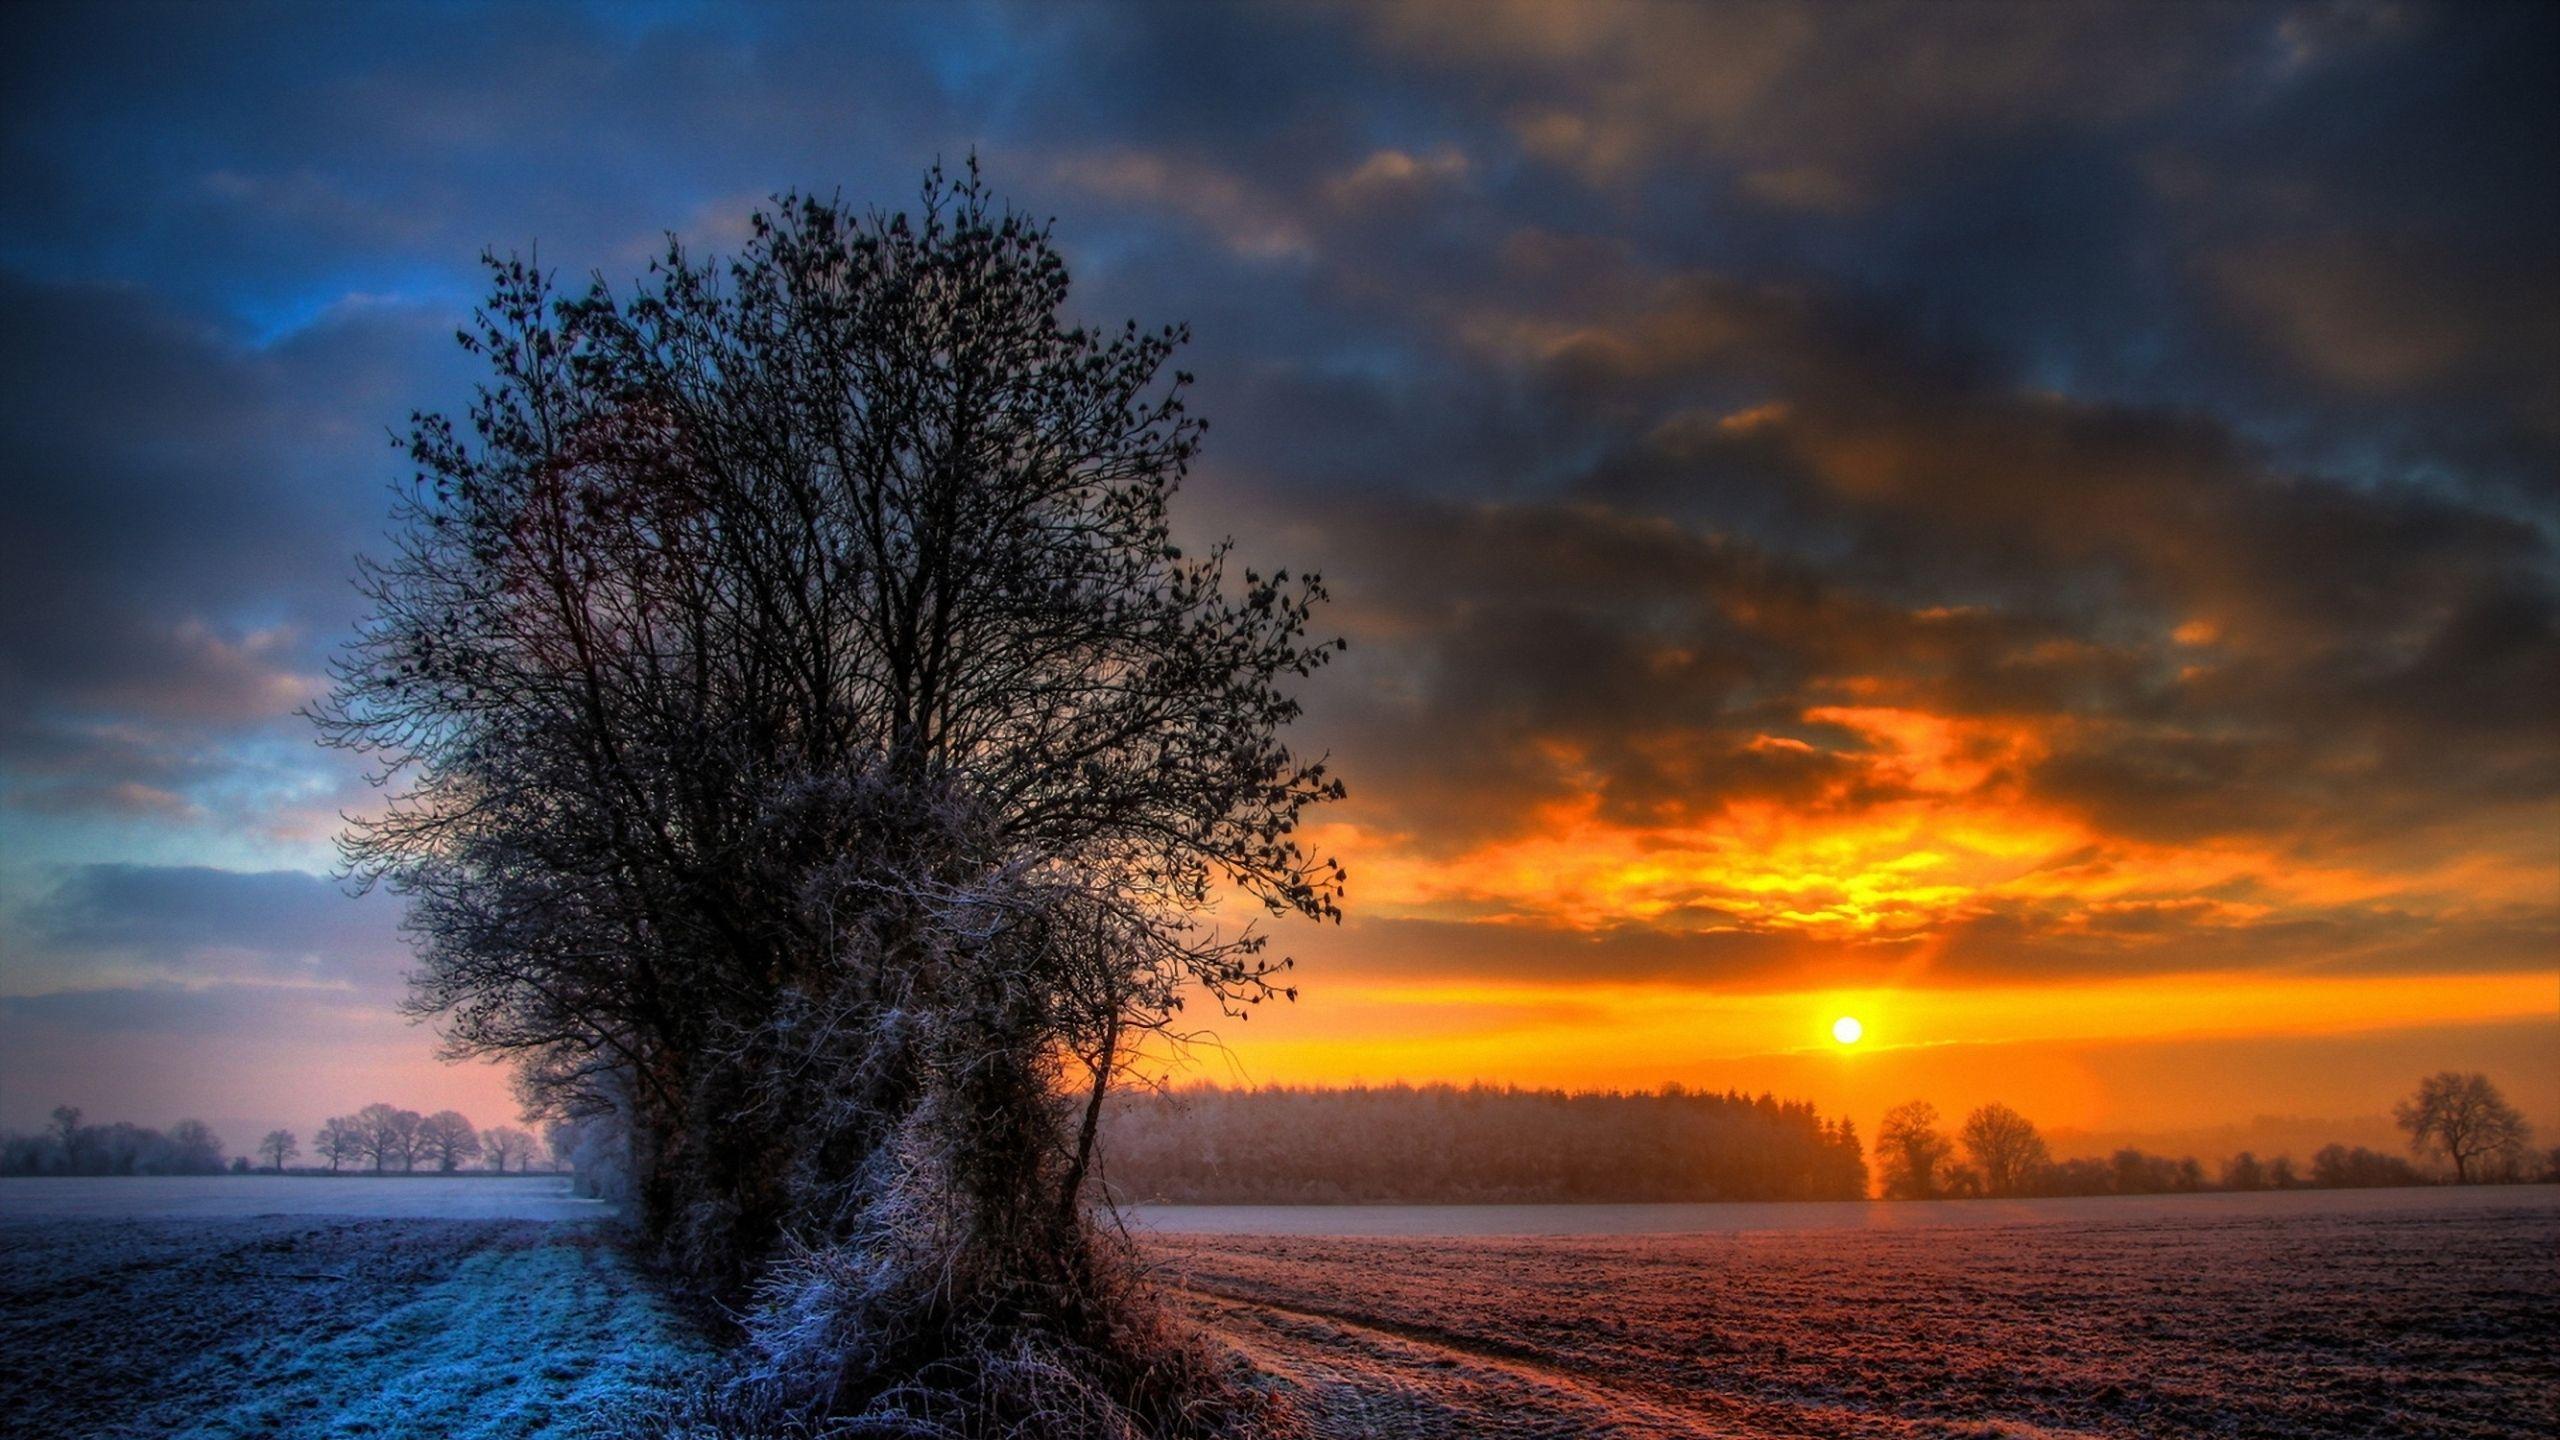 2560x1440 Wallpaper Field Frost Tree Sun Winter Sunset Wallpaper Winter Sunset Sunset Photos Hd wallpaper sunset snow winter field